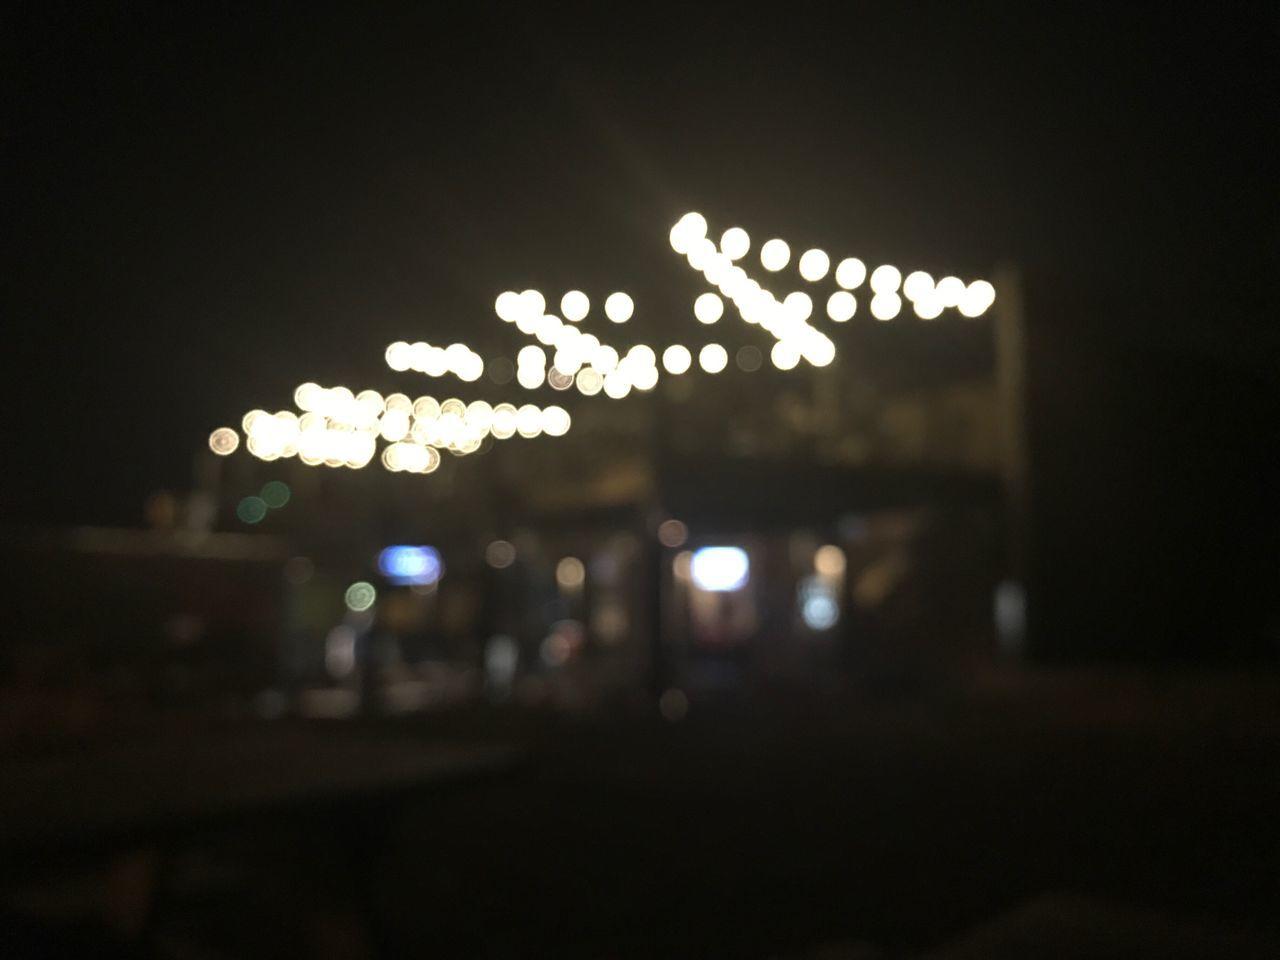 Blurred outdoor nightlife. Illuminated Night Defocused Dark No People City Close-up Outdoors Lights Nightlife